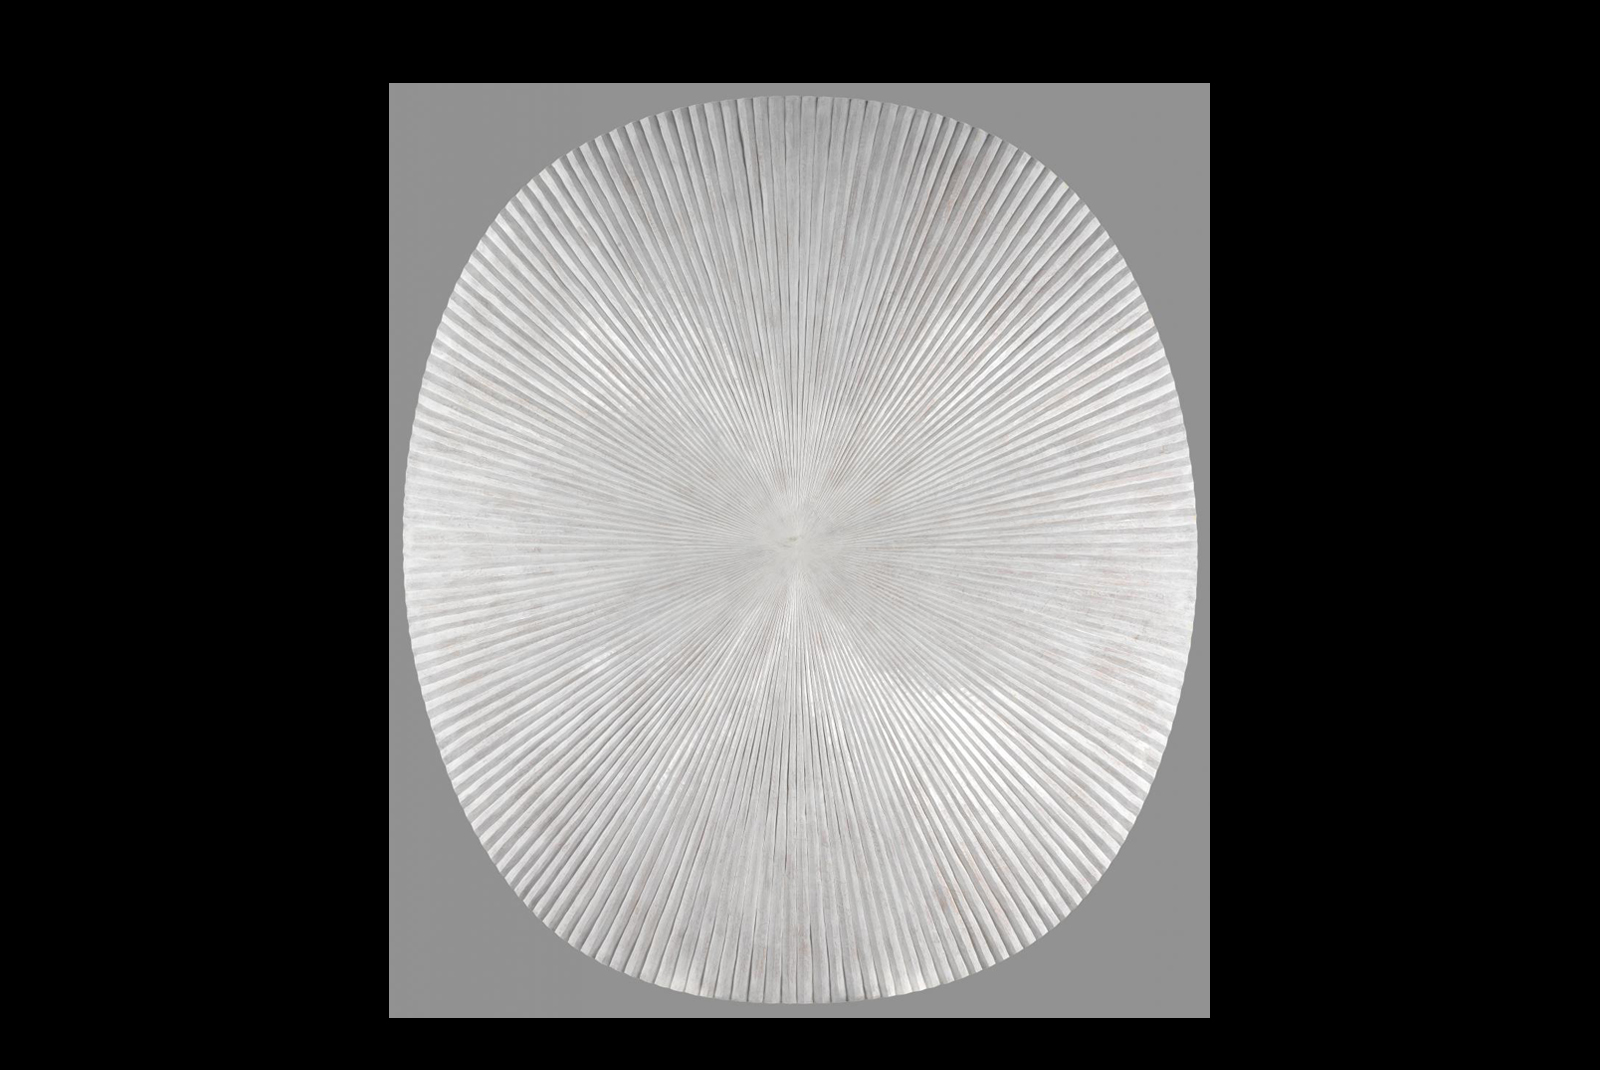 Shield of Antarctica (Tangaroa / Water), sculpture by New Zealand artist Brett Graham